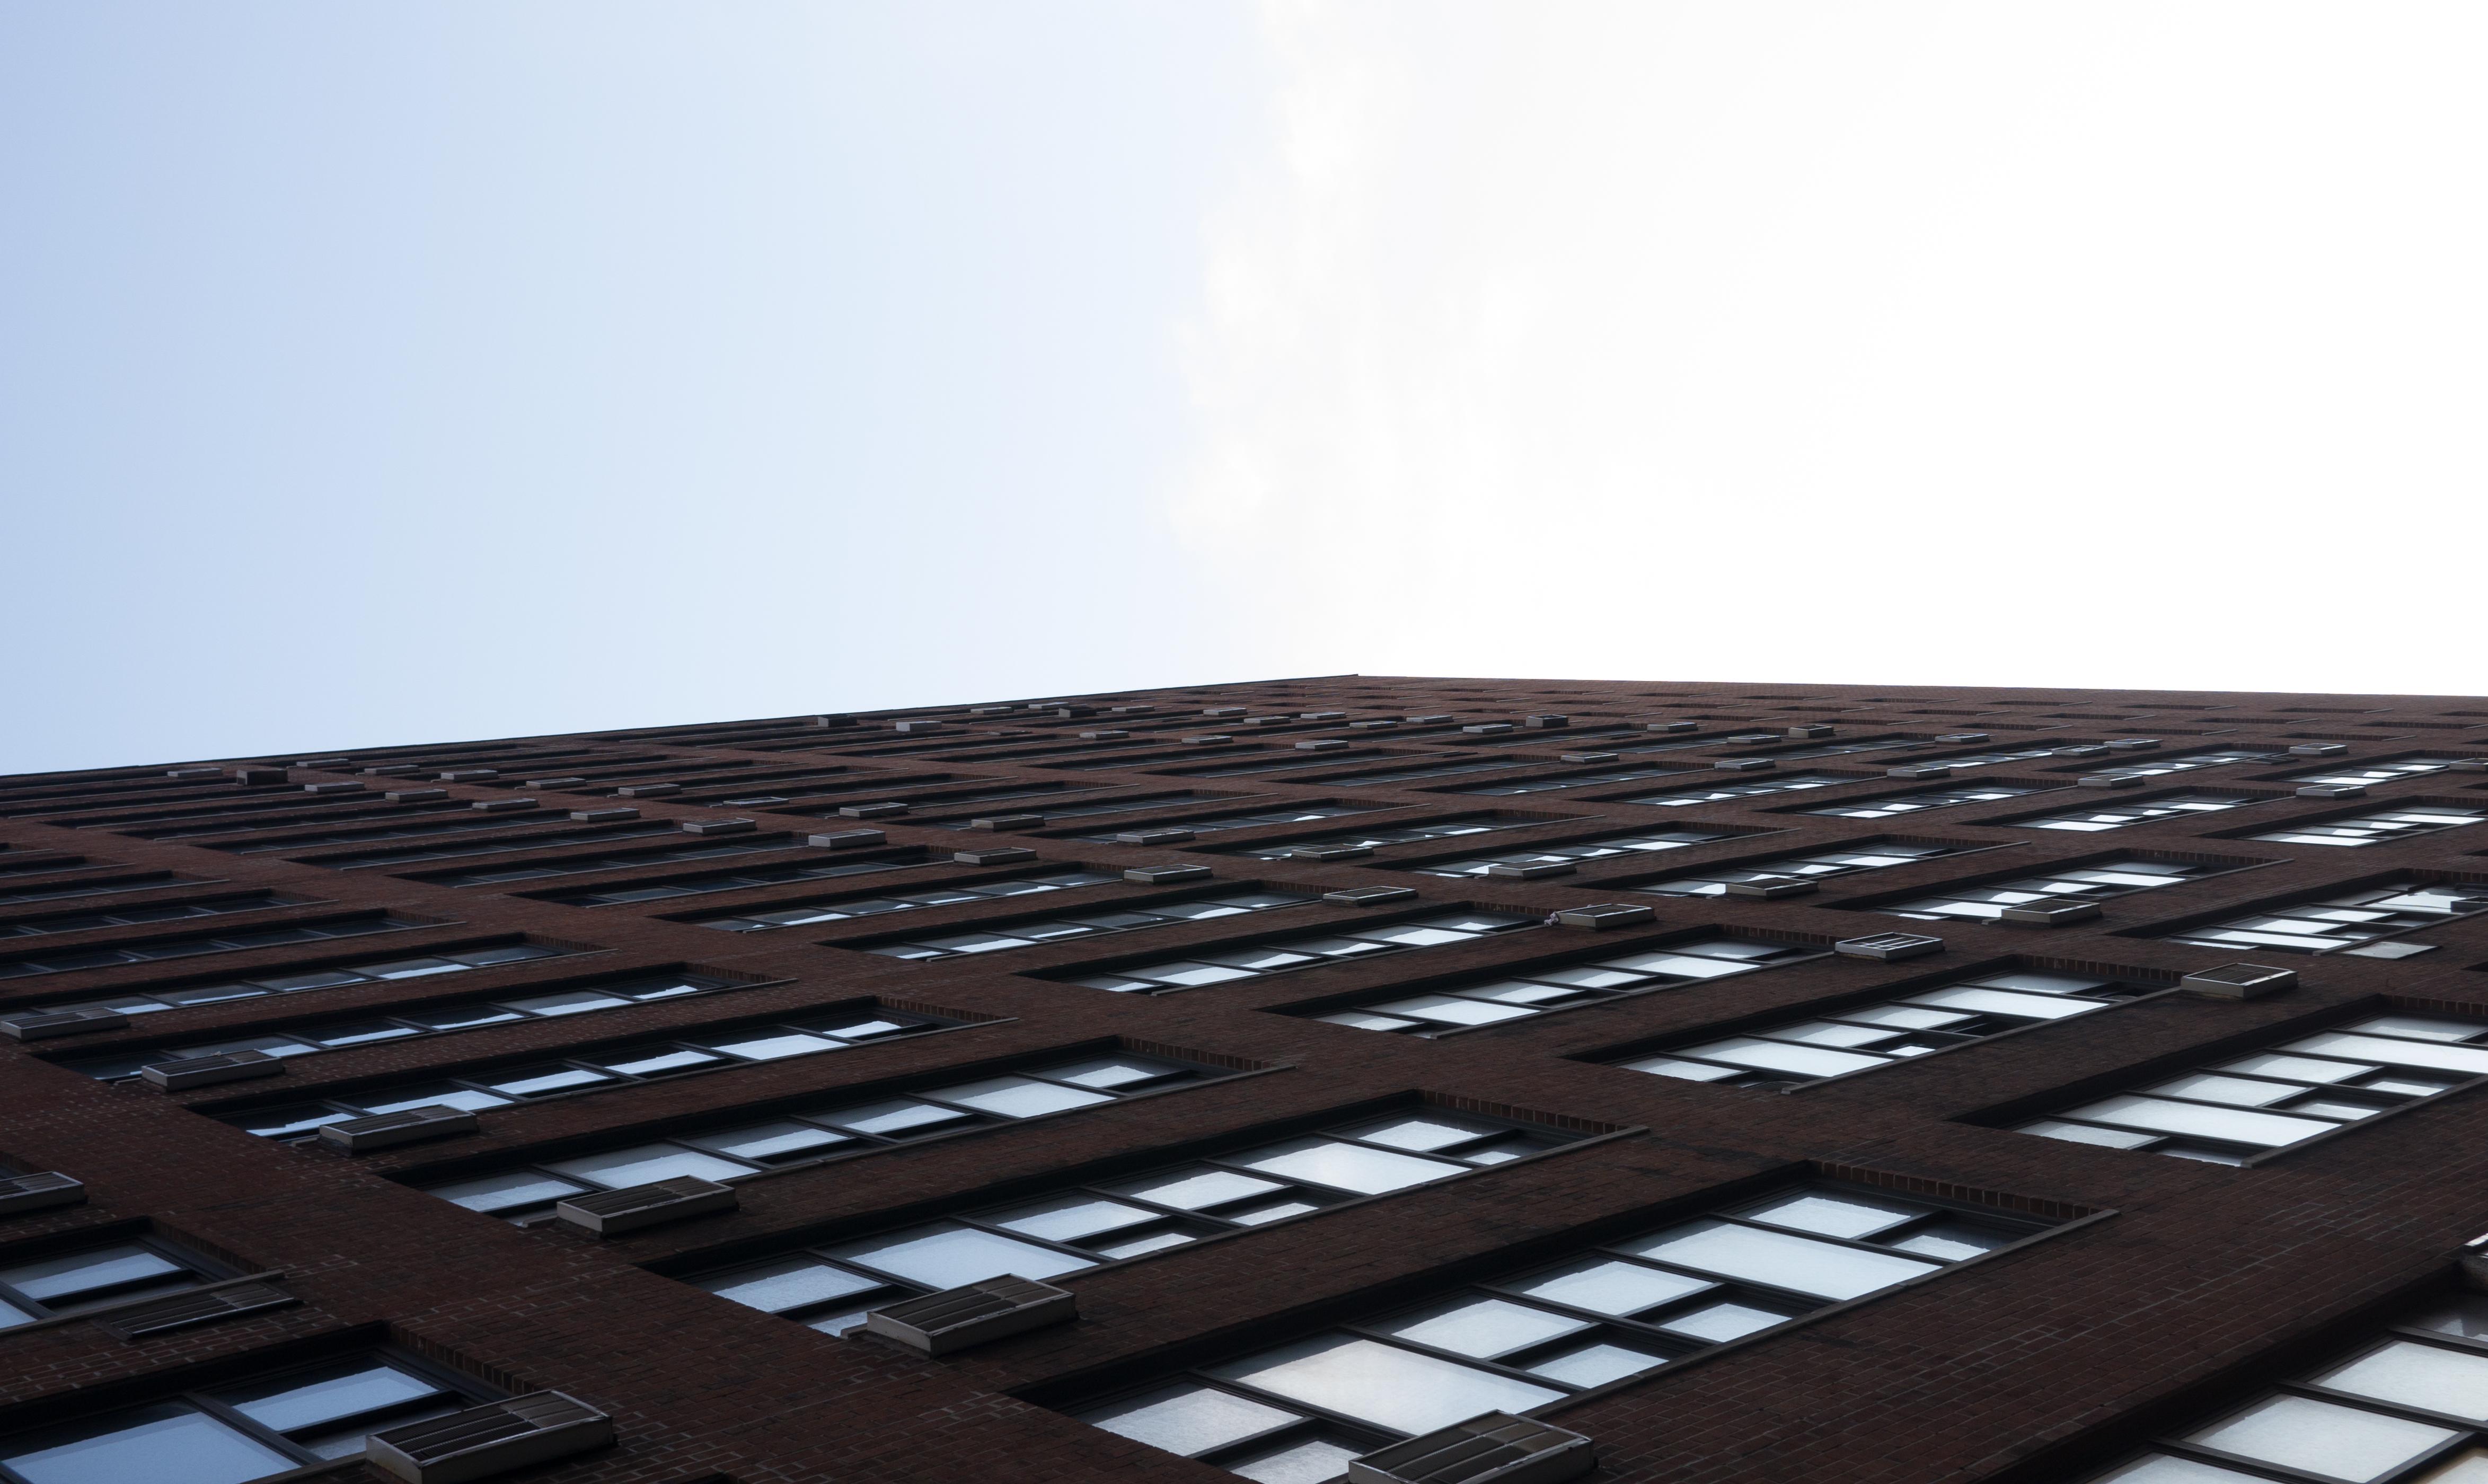 nyu building nyc photo